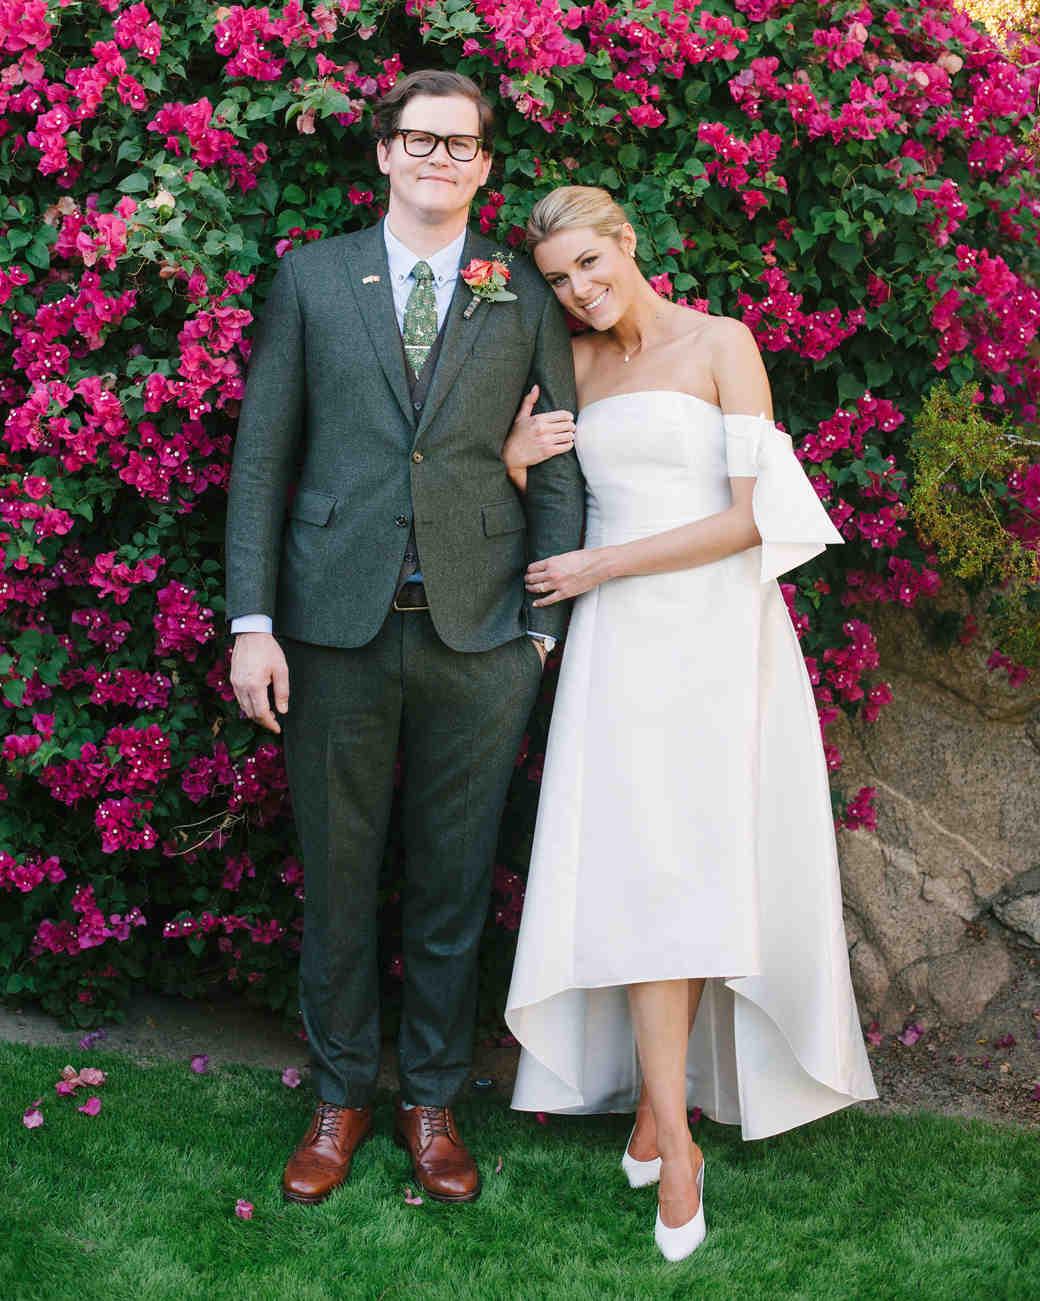 lisa louis wedding couple pink flowers